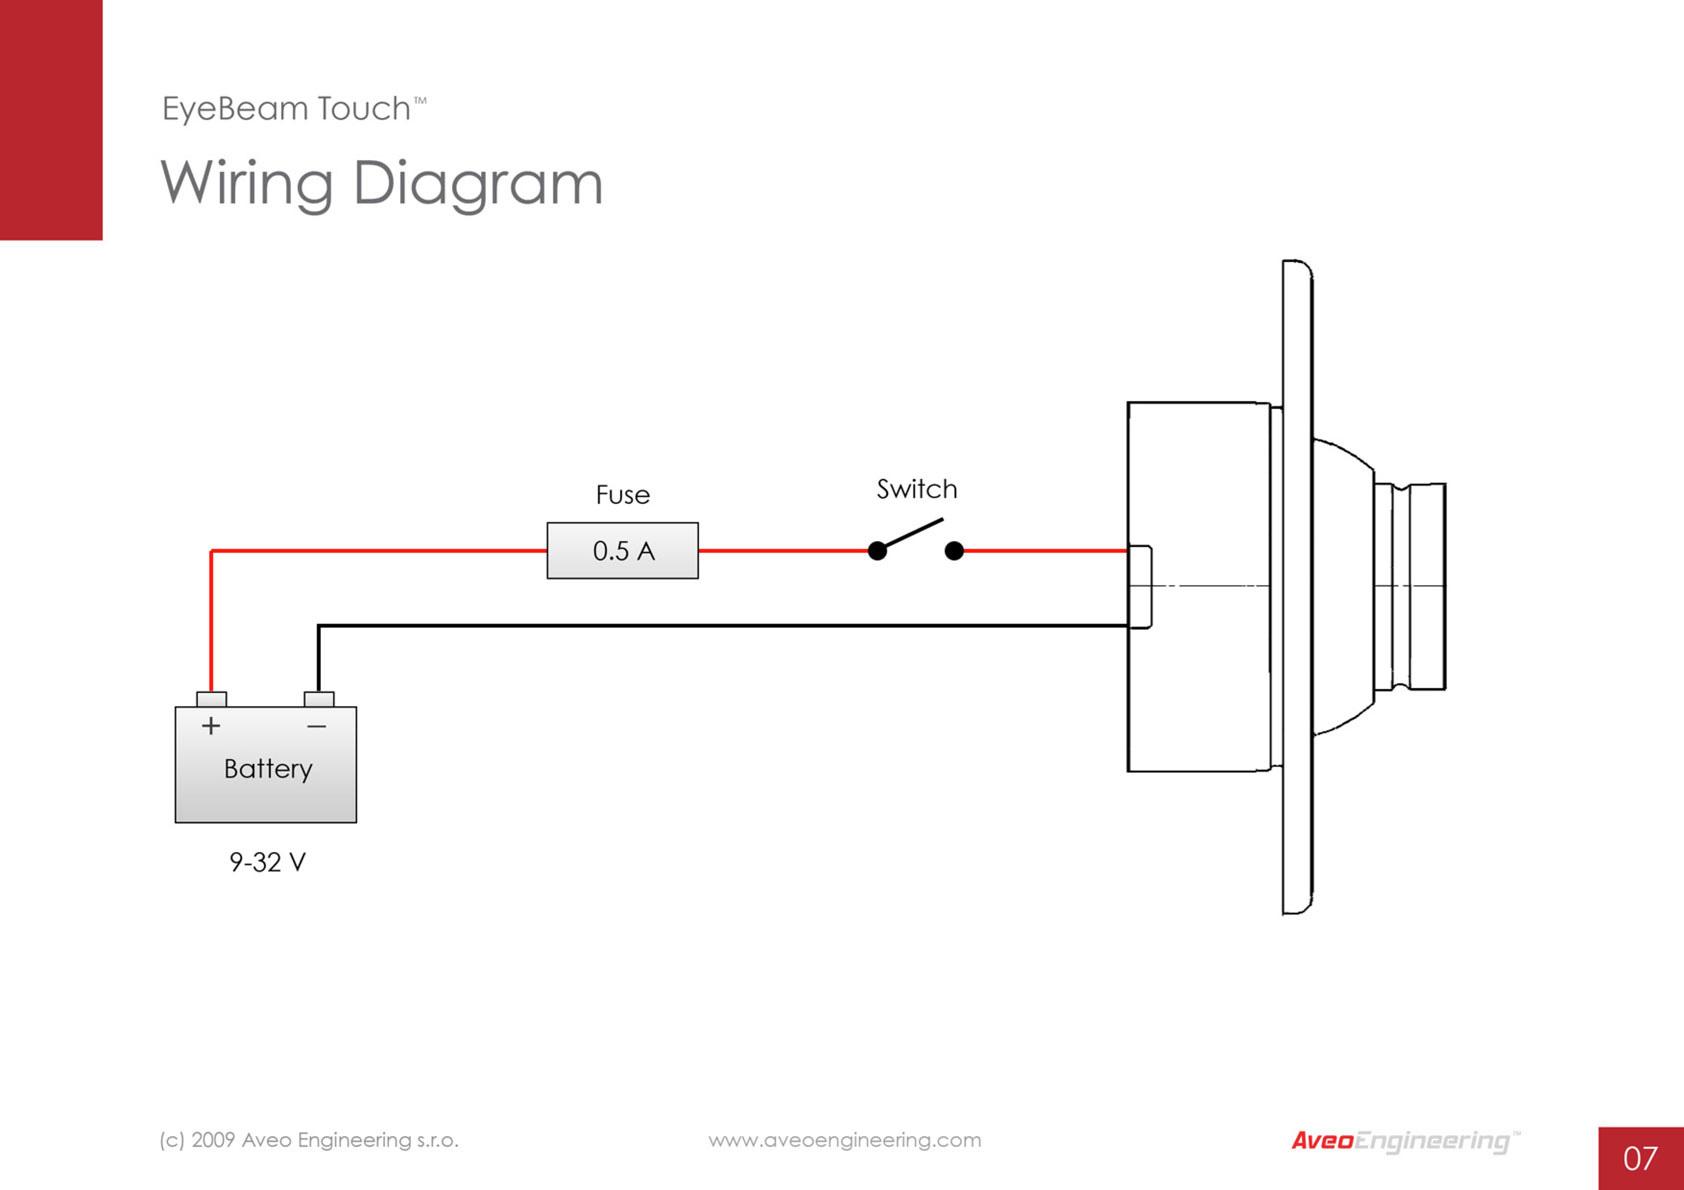 Astonishing Diagram In Addition Usb Cable Pinout Diagram On Iphone 5 Usb Charger Wiring Cloud Icalpermsplehendilmohammedshrineorg